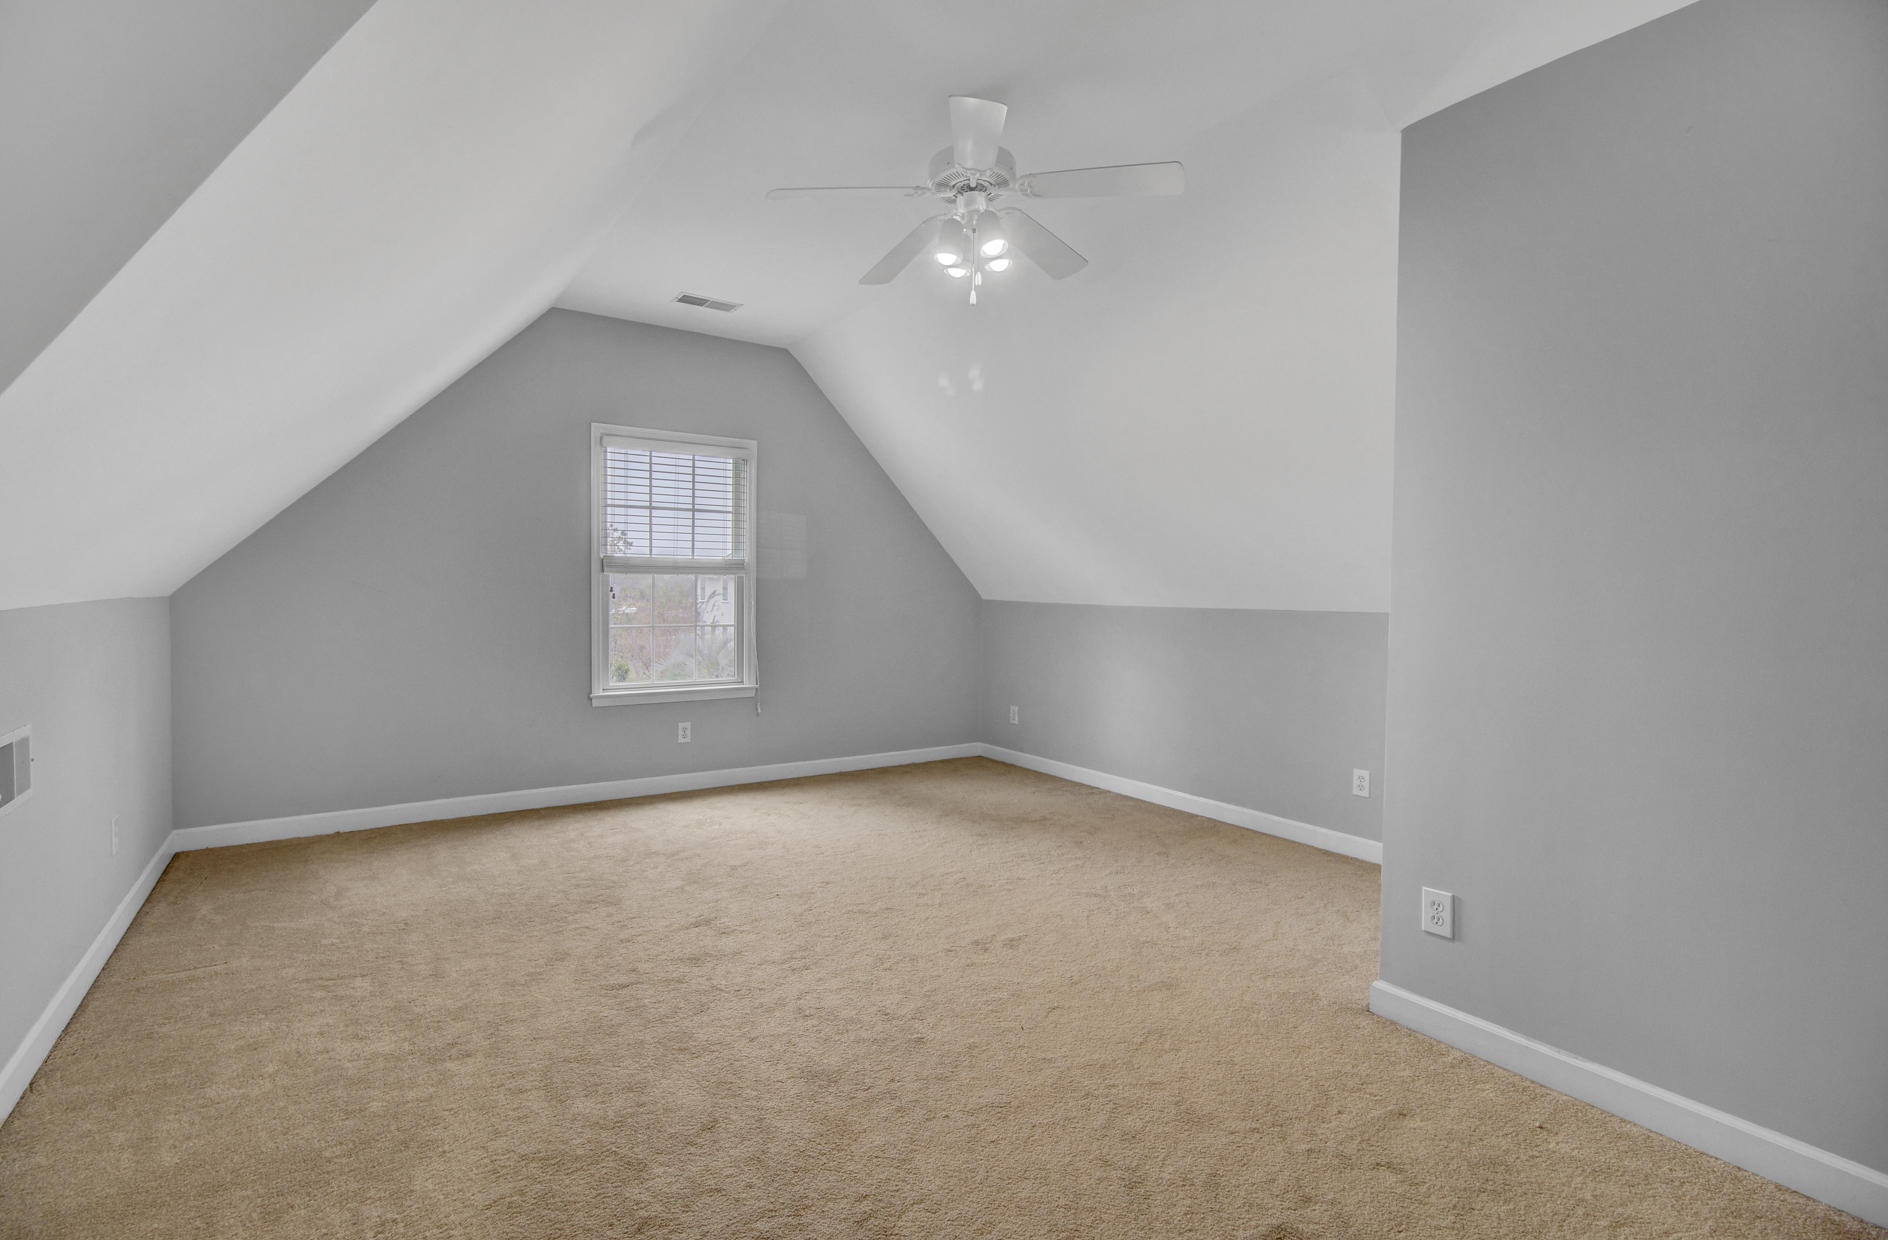 Dunes West Homes For Sale - 2321 Darts Cove, Mount Pleasant, SC - 25